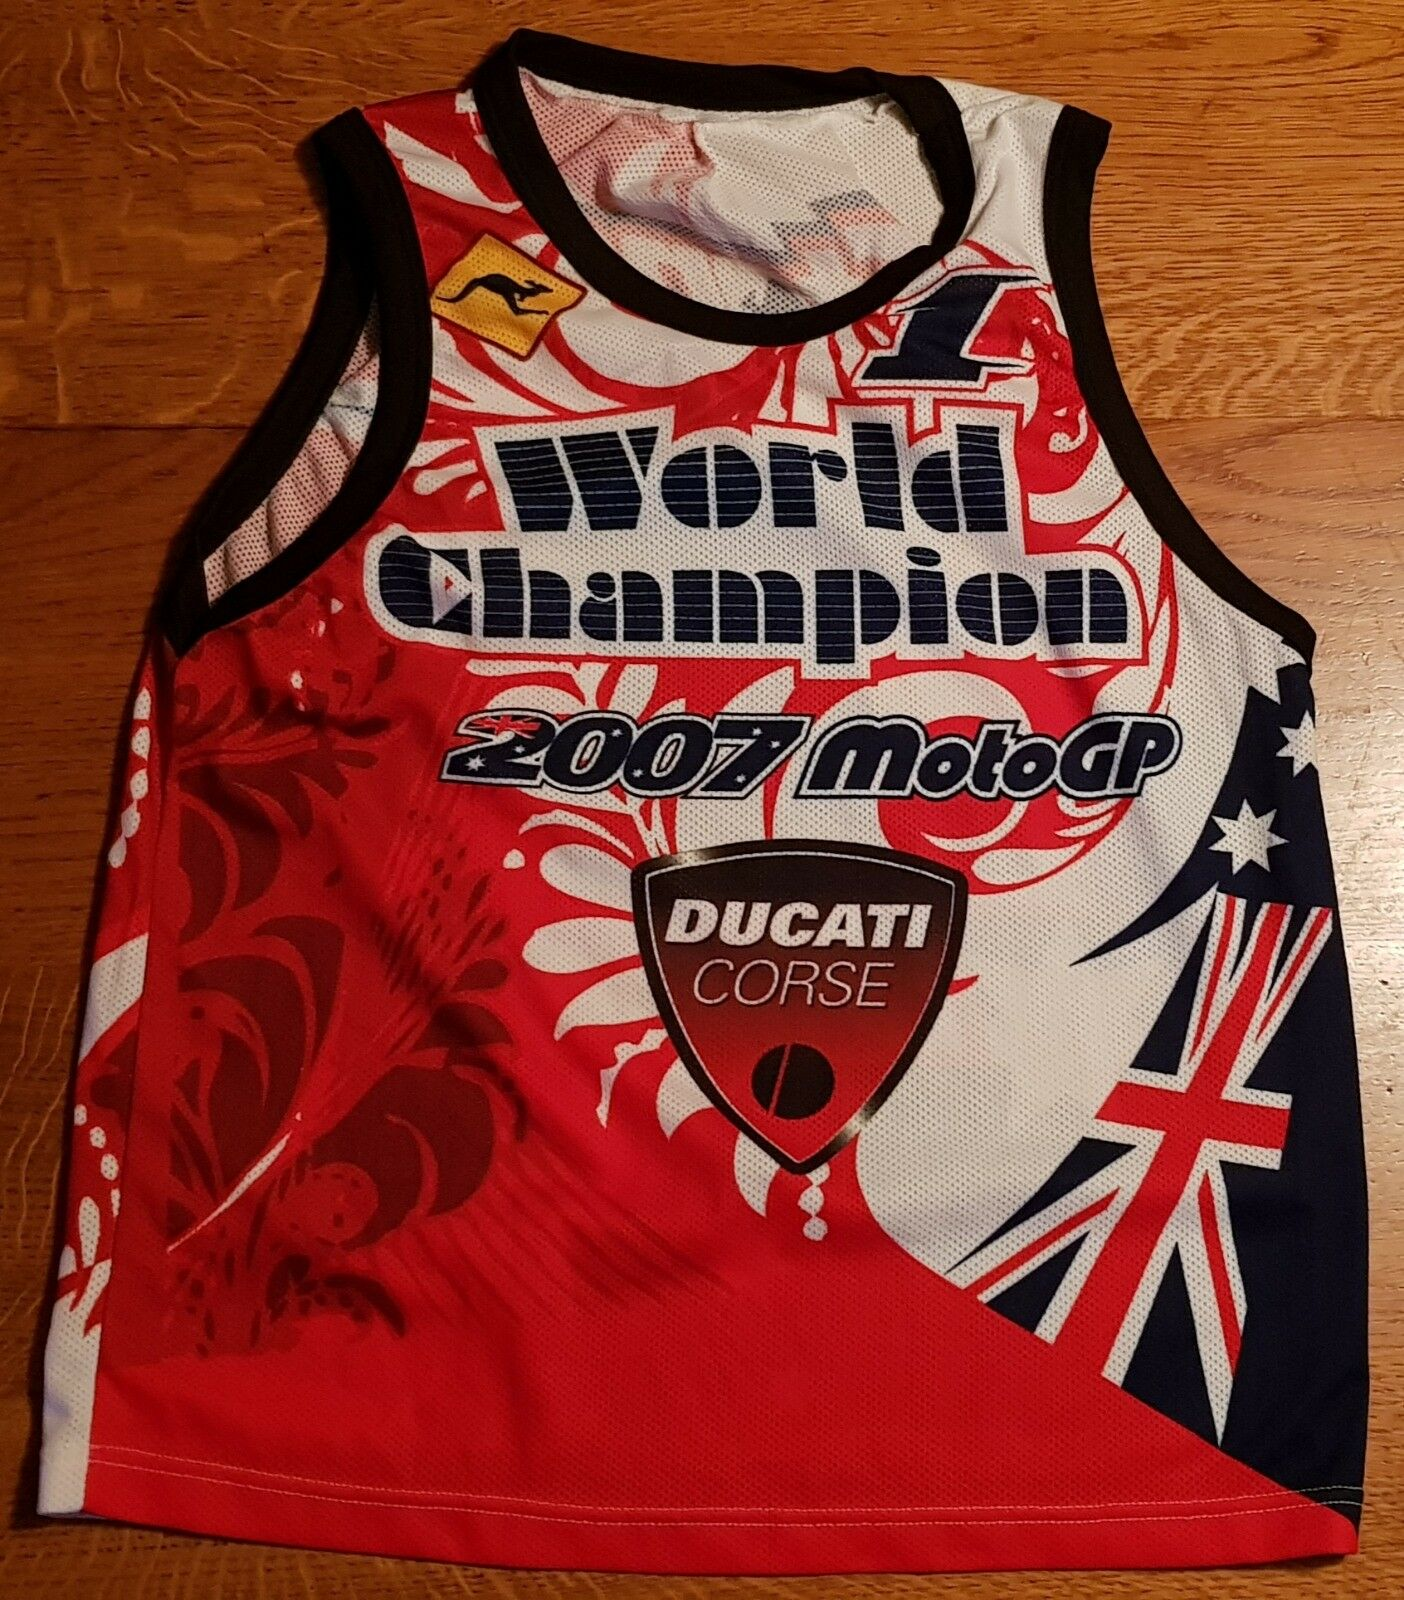 DUCATI CORSE STONER  27 CANOTTIERA, WORLD CHAMPION 2007 MOTOGP 1